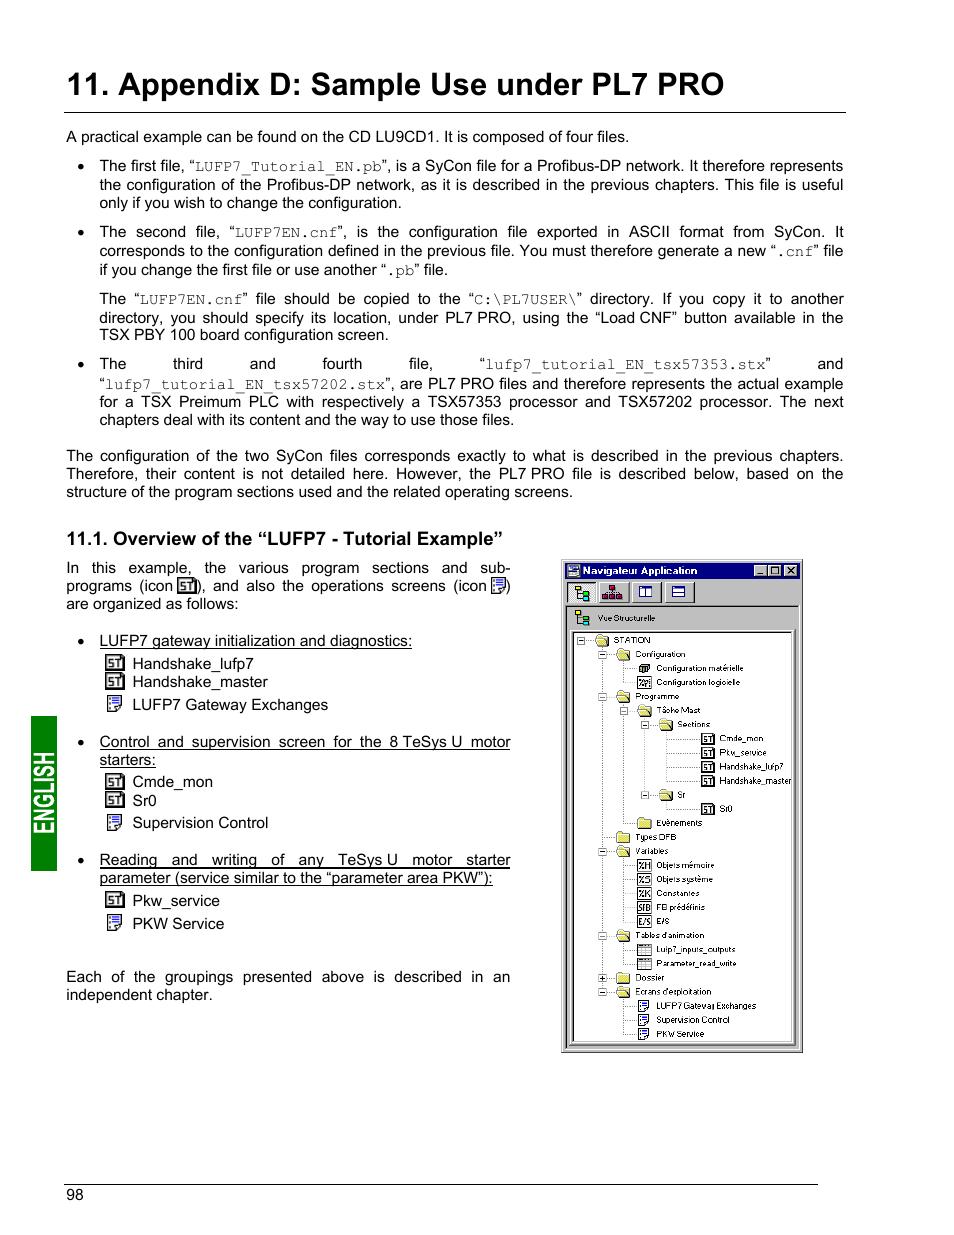 lufp7 gateway initialization and diagnostics appendix d sample use rh manualsdir com Radio Shack Scanners Radio Shack Scanners